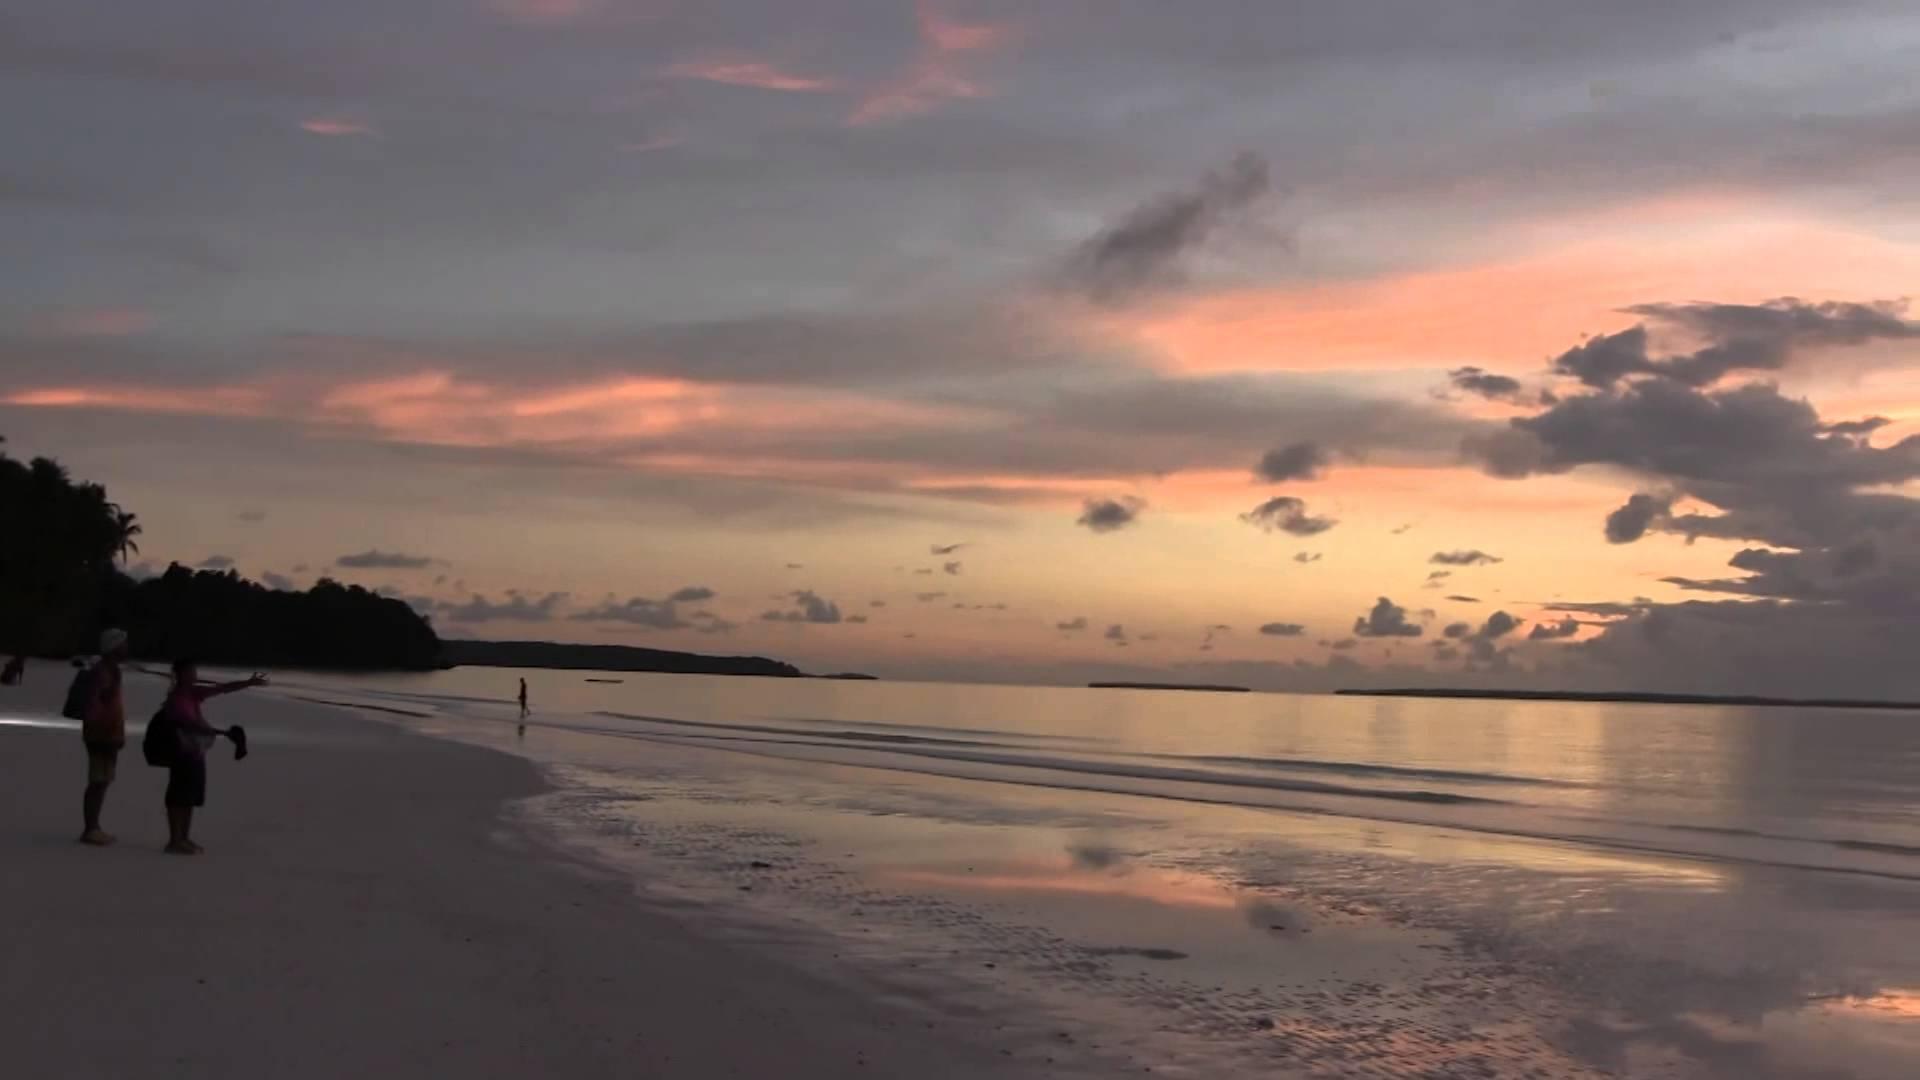 Pasir Panjang Pantai Ngurbloat Kepulauan Kai Maluku Indonesia Kota Tual